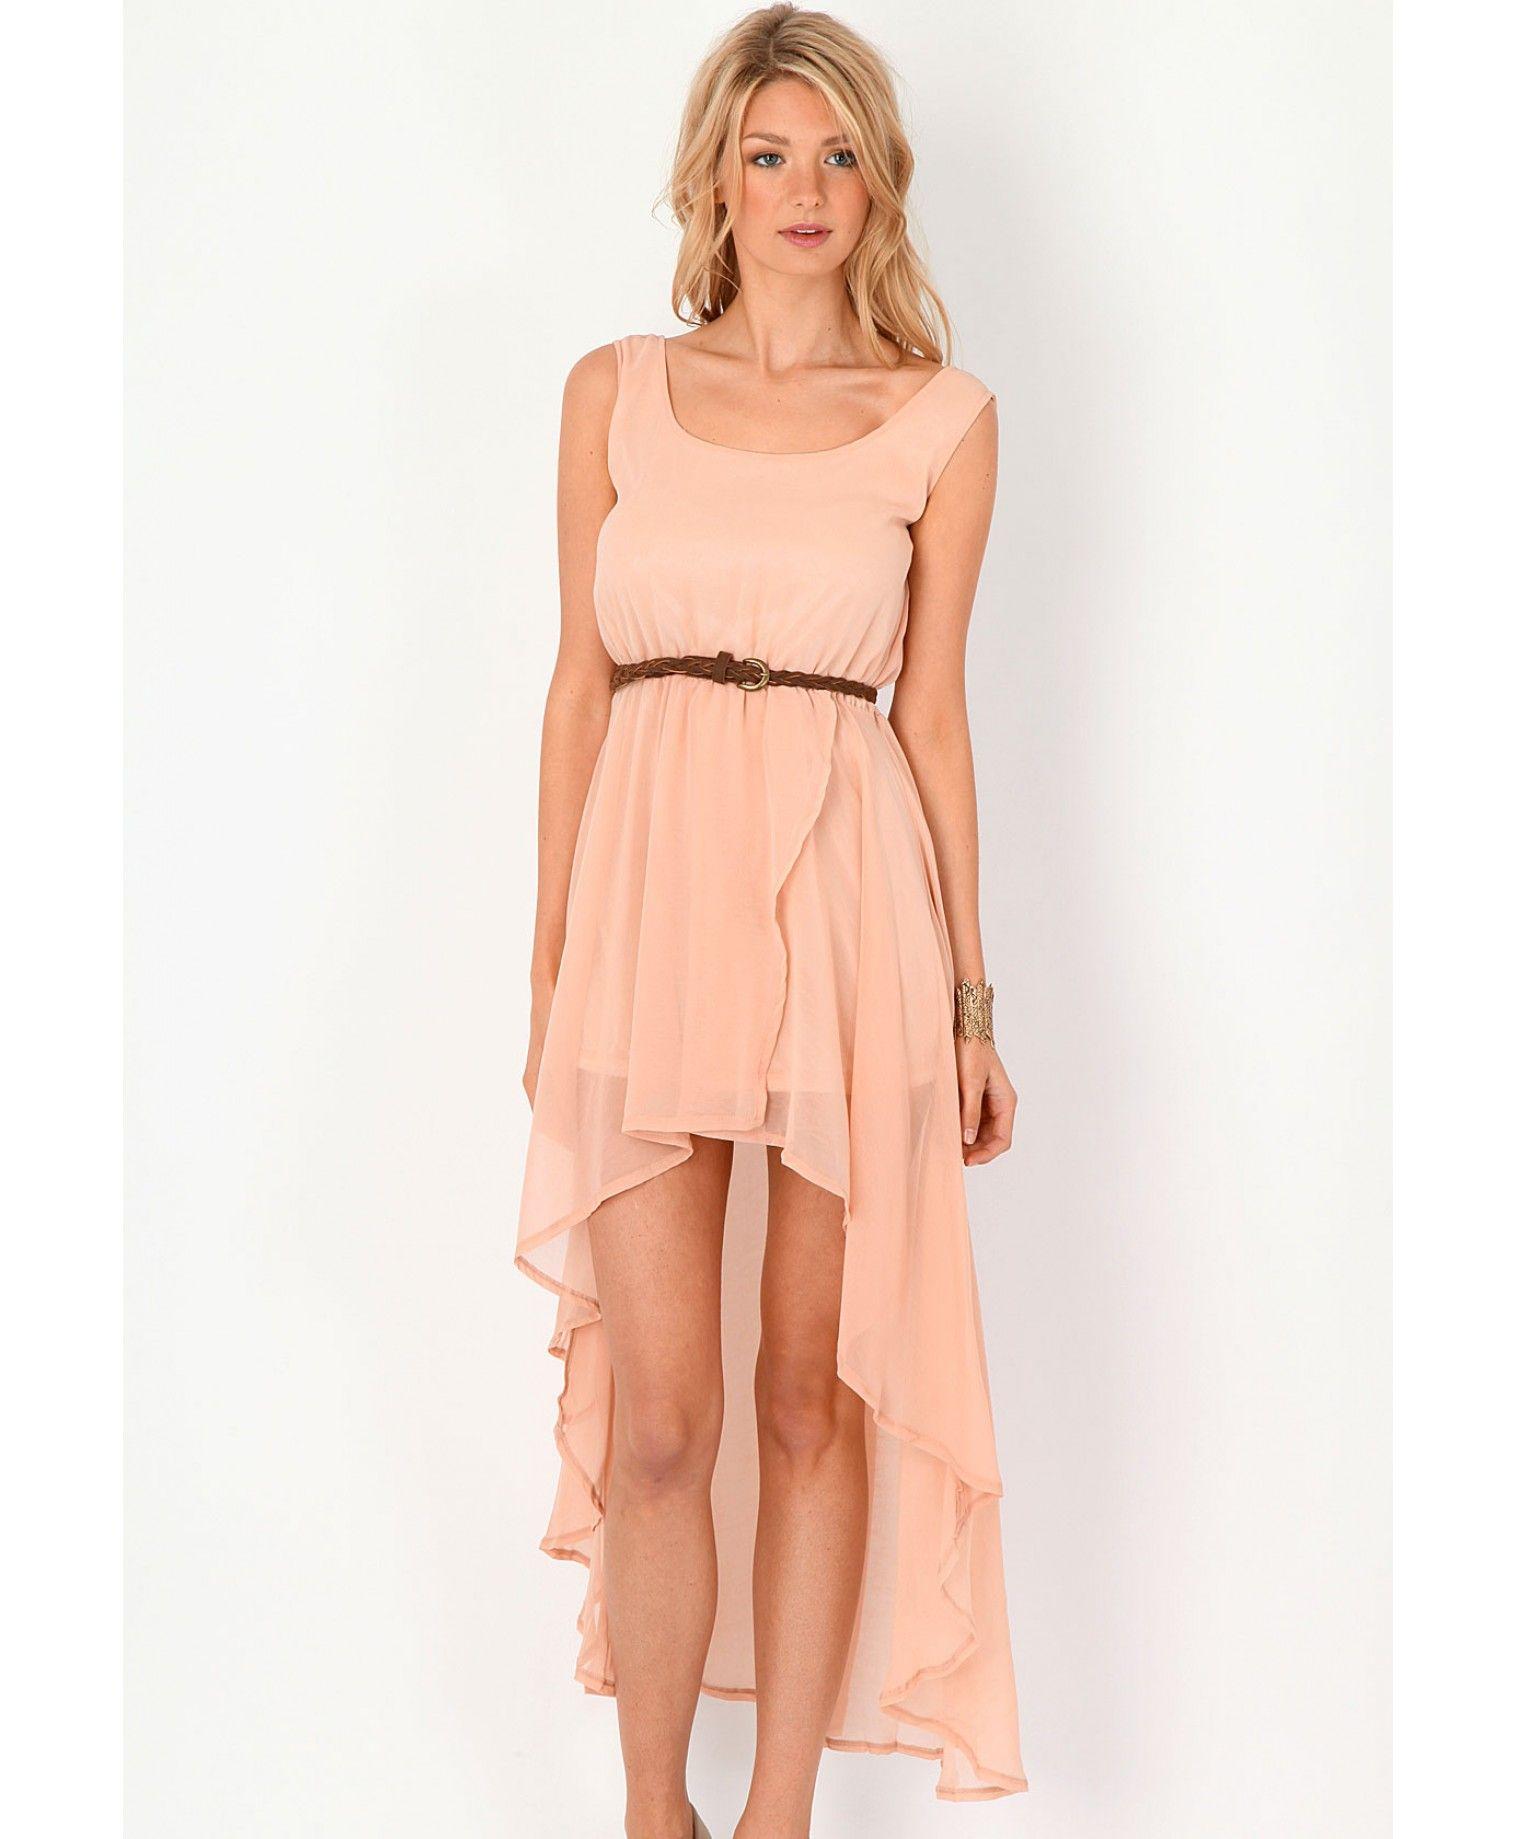 Ileana sheer asymmetric maxi dress dresses missguided clothing